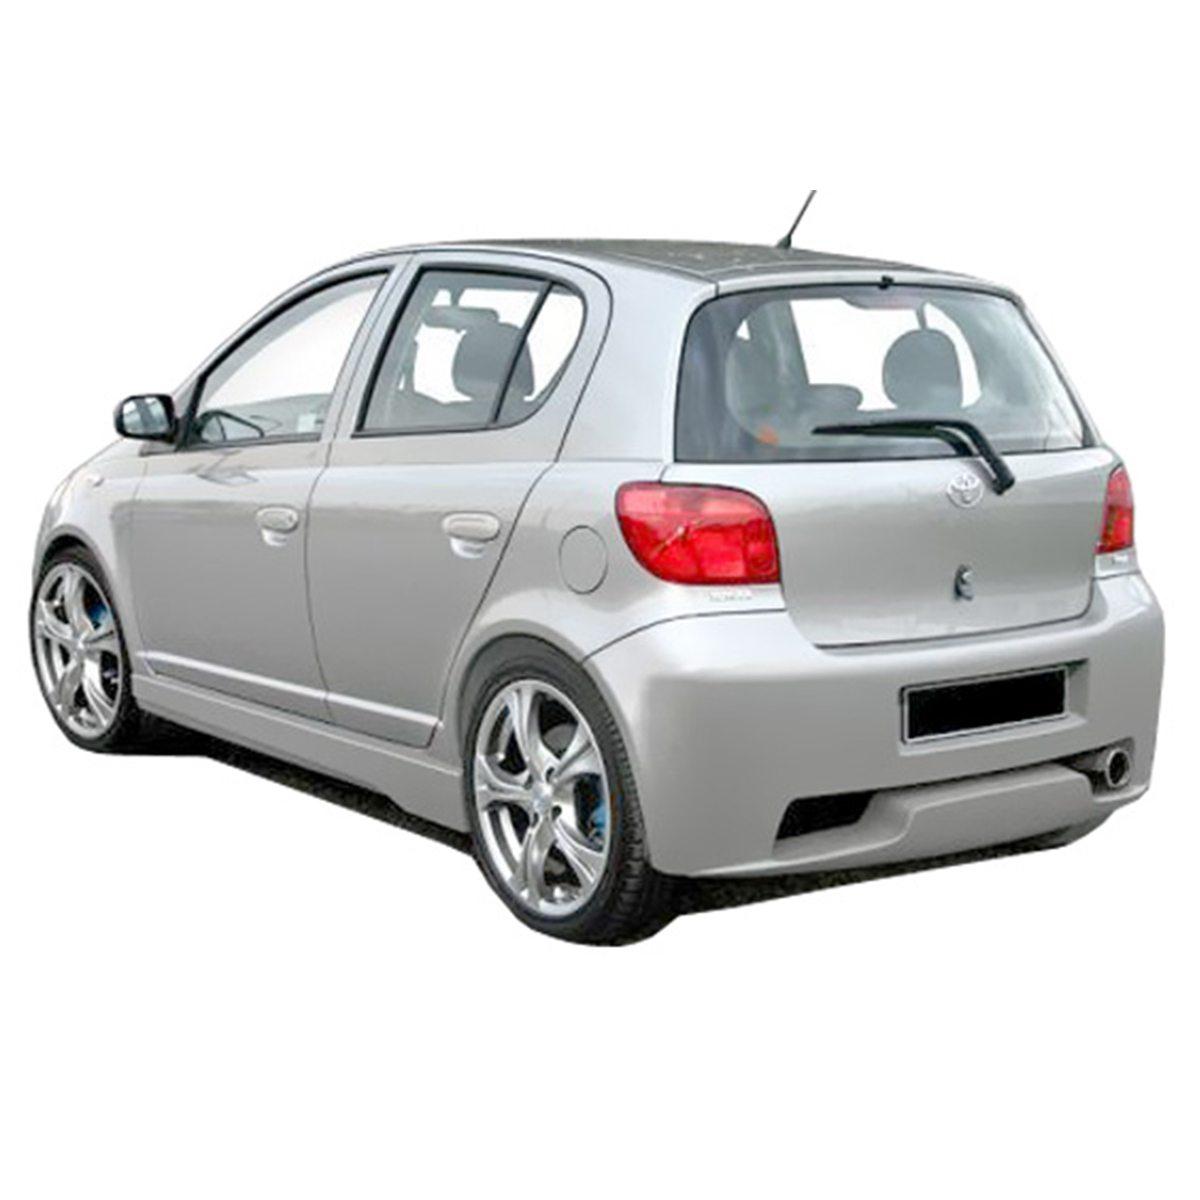 Toyota-Yaris-2003-Imagine-tras-PCS226